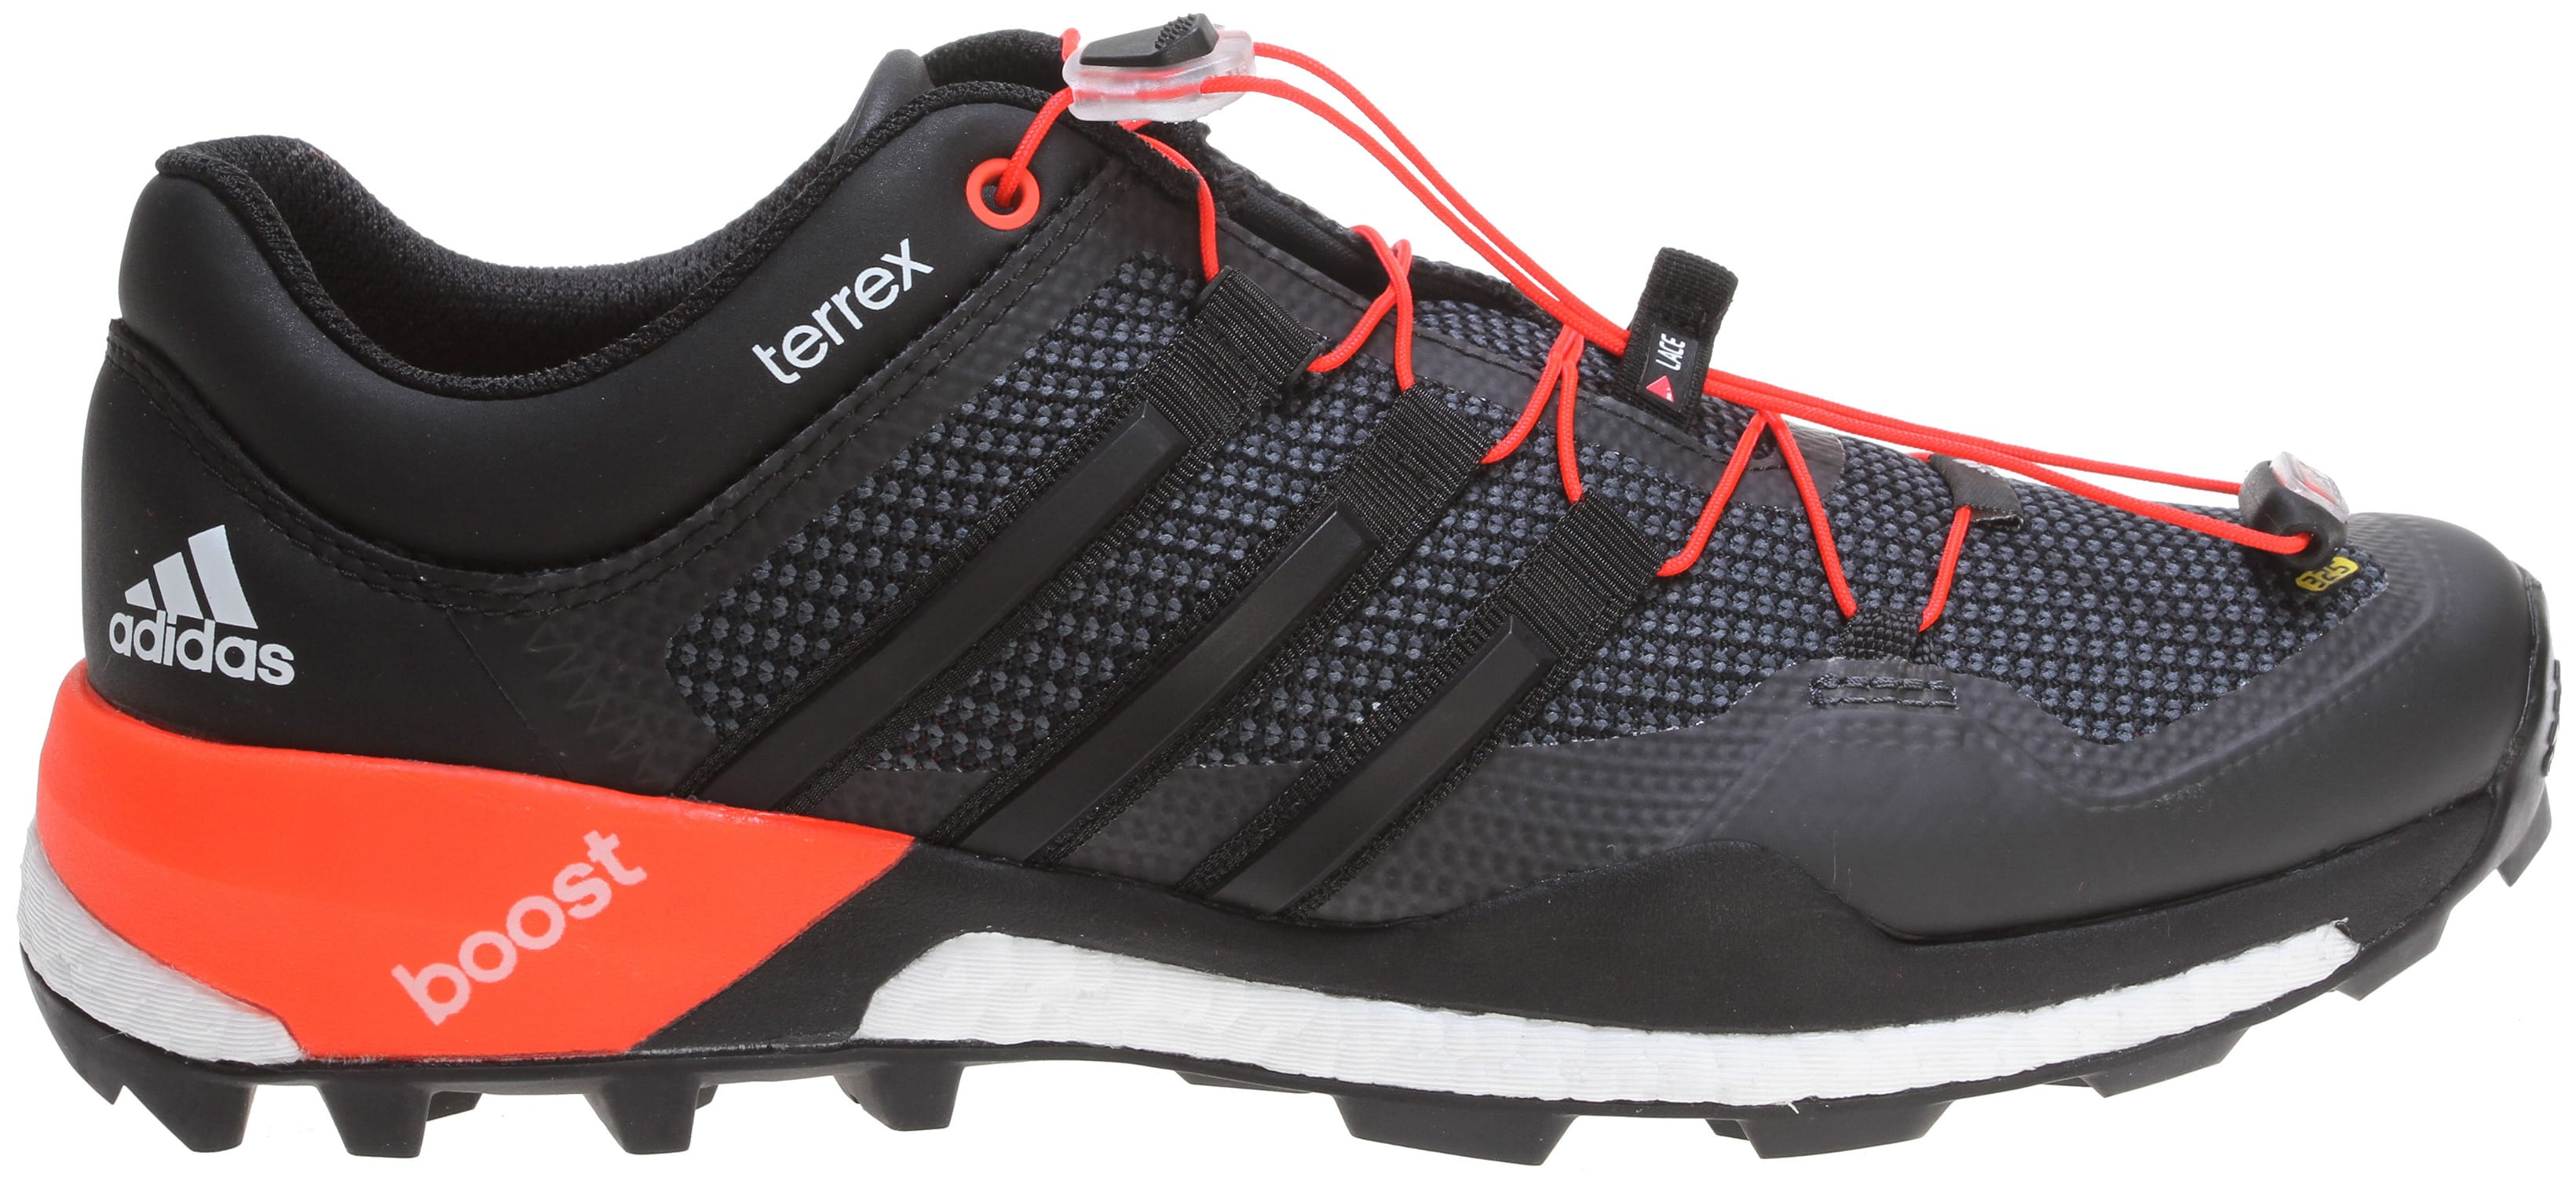 adidas hiking schoenen